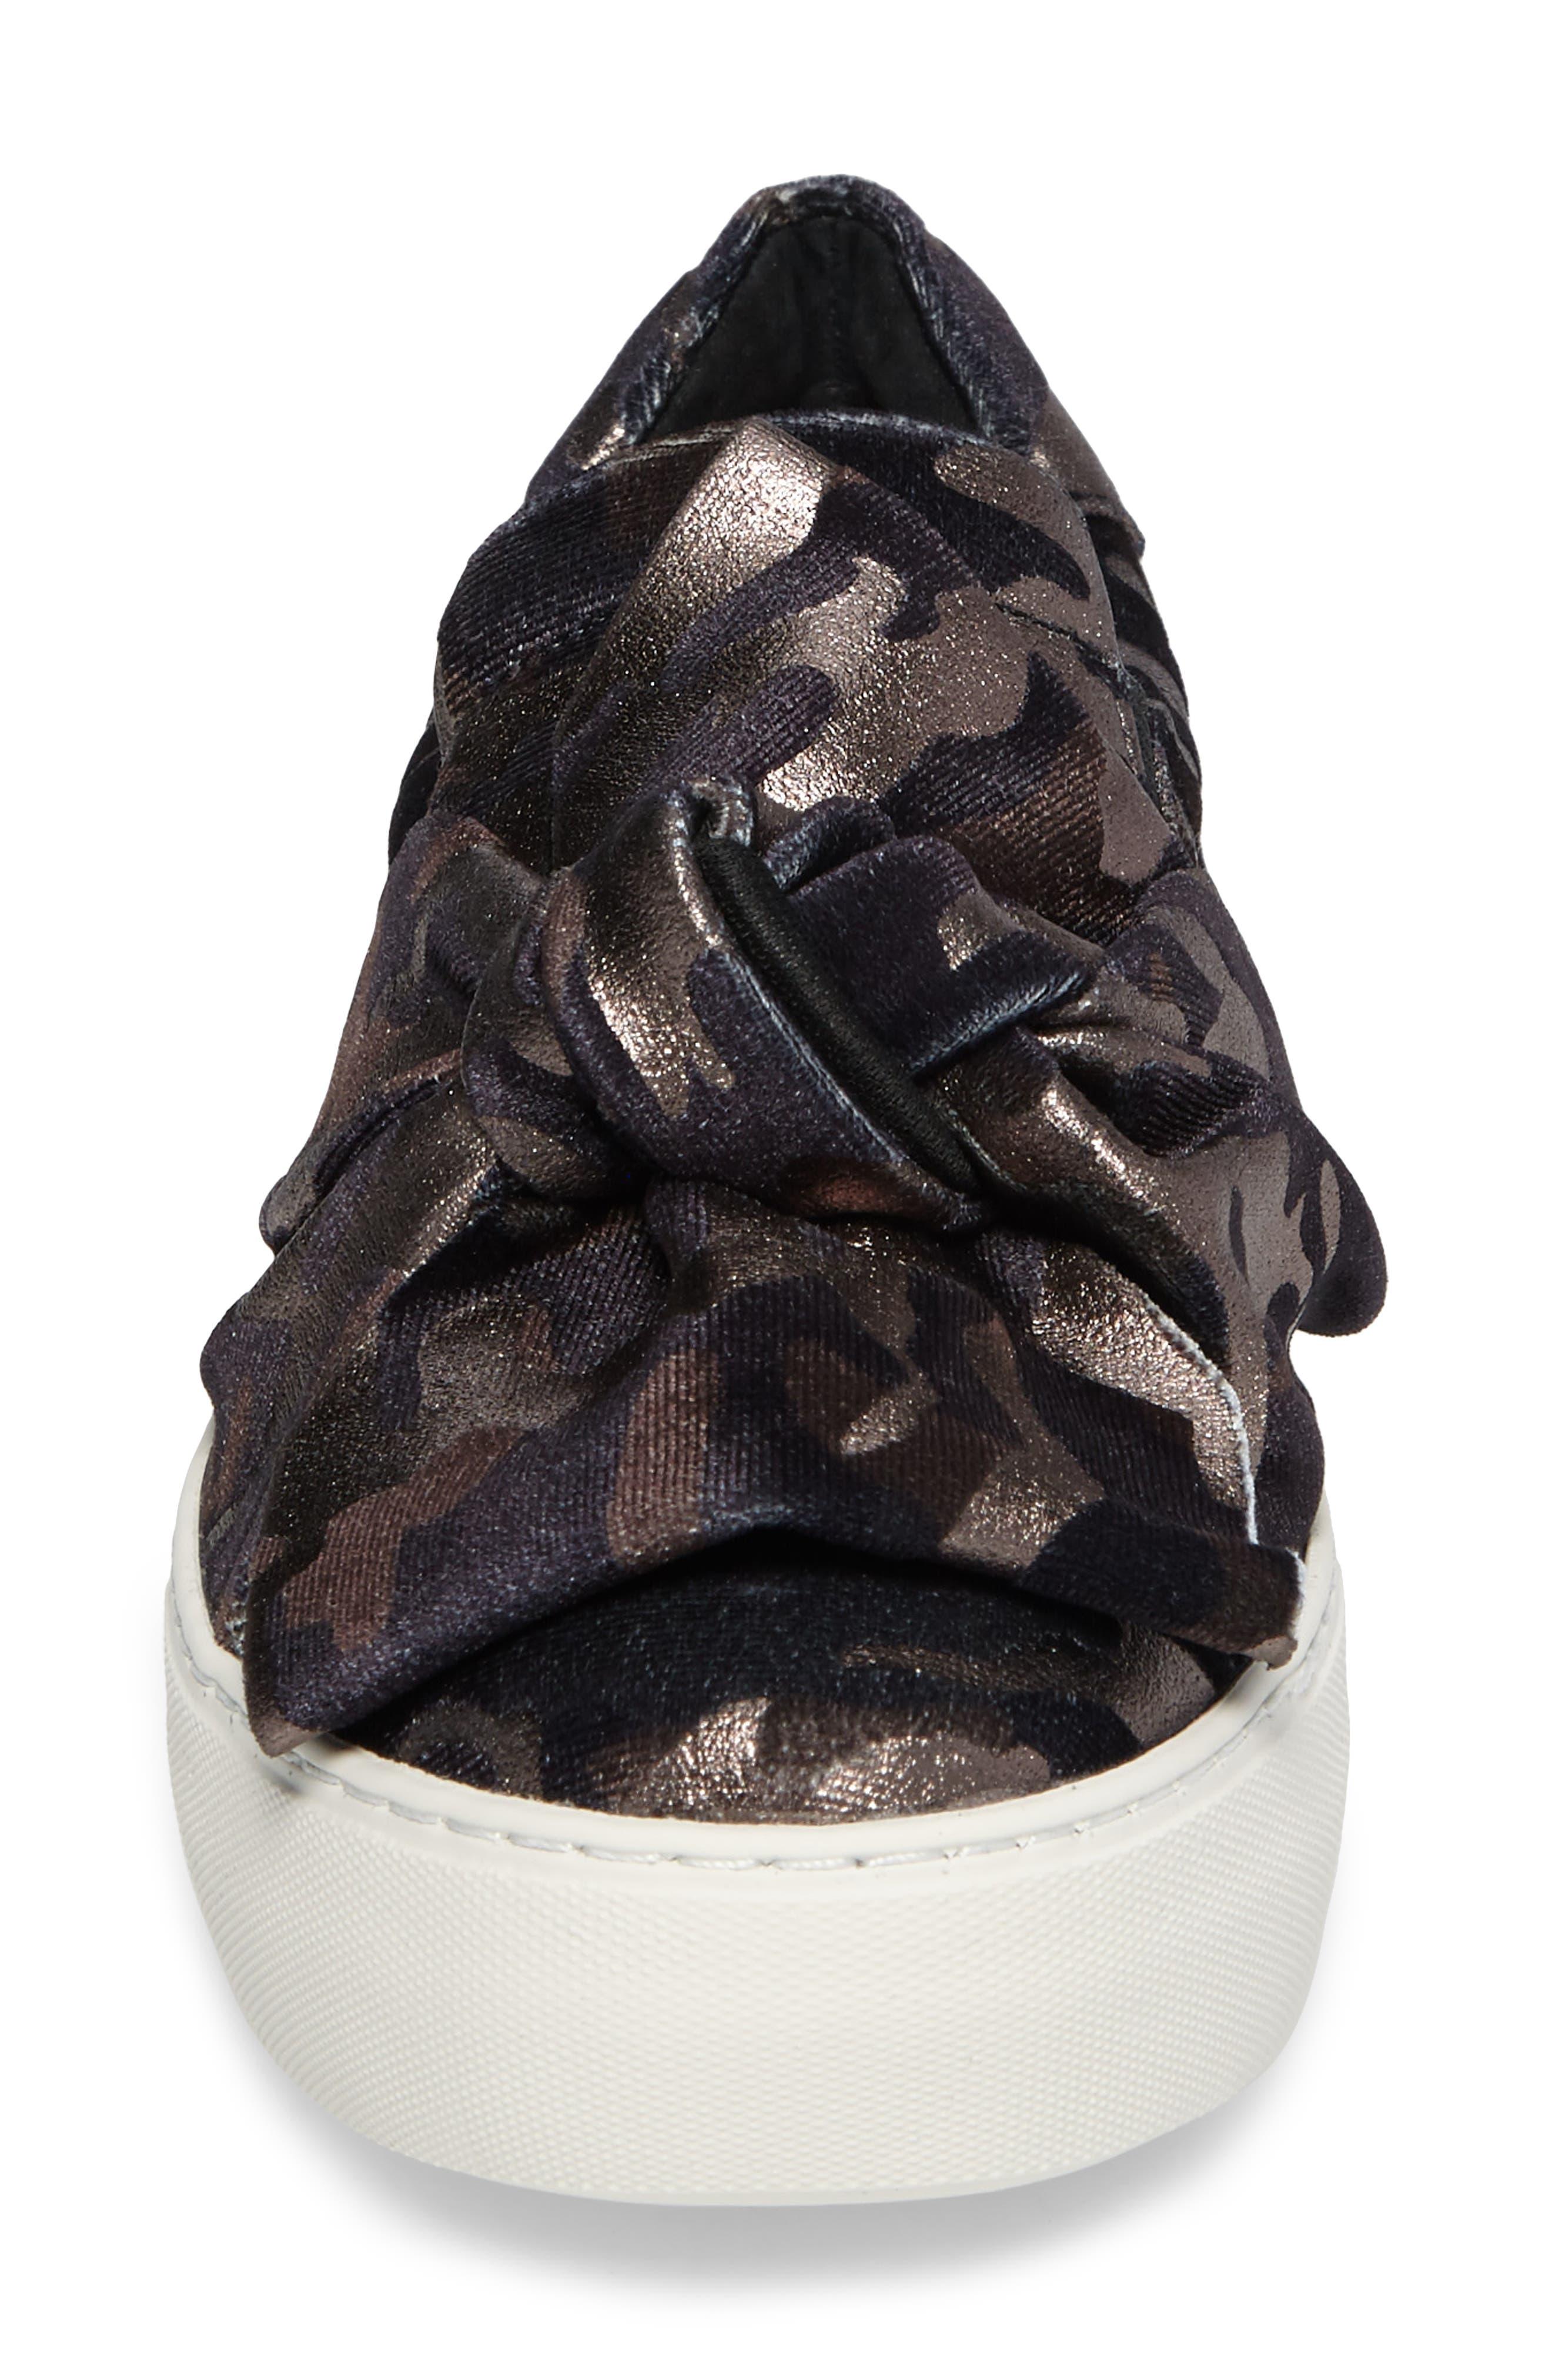 Audra Slip-On Sneaker,                             Alternate thumbnail 4, color,                             Black Camo Fabric